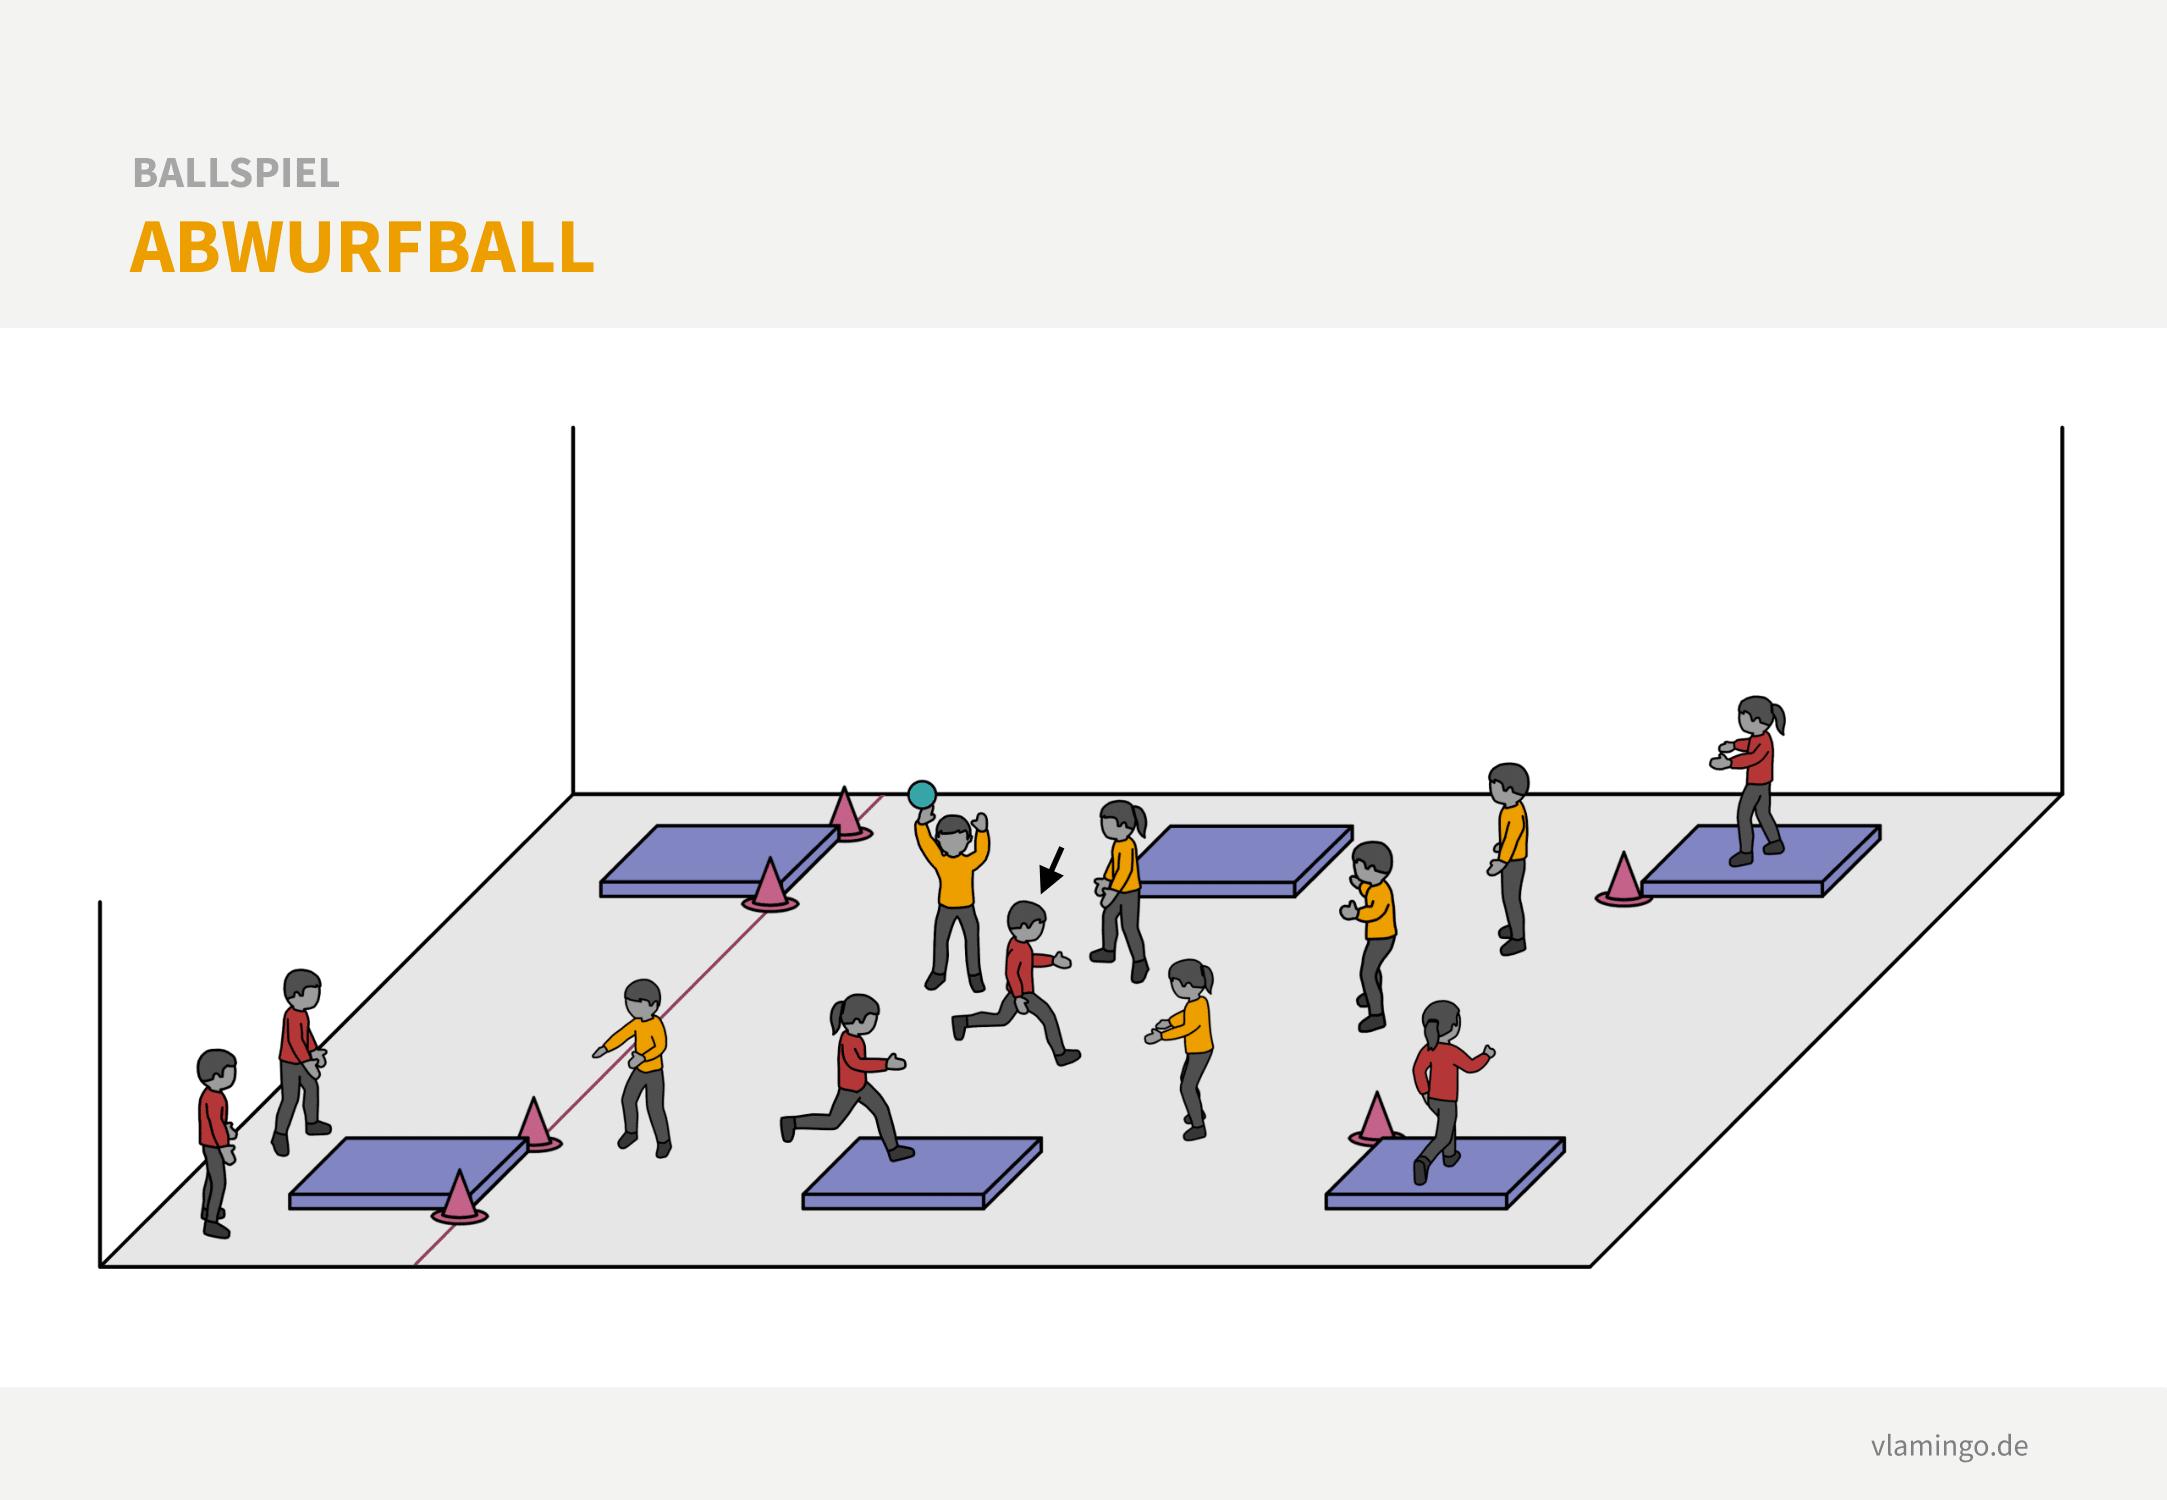 Variante: Abwurfball